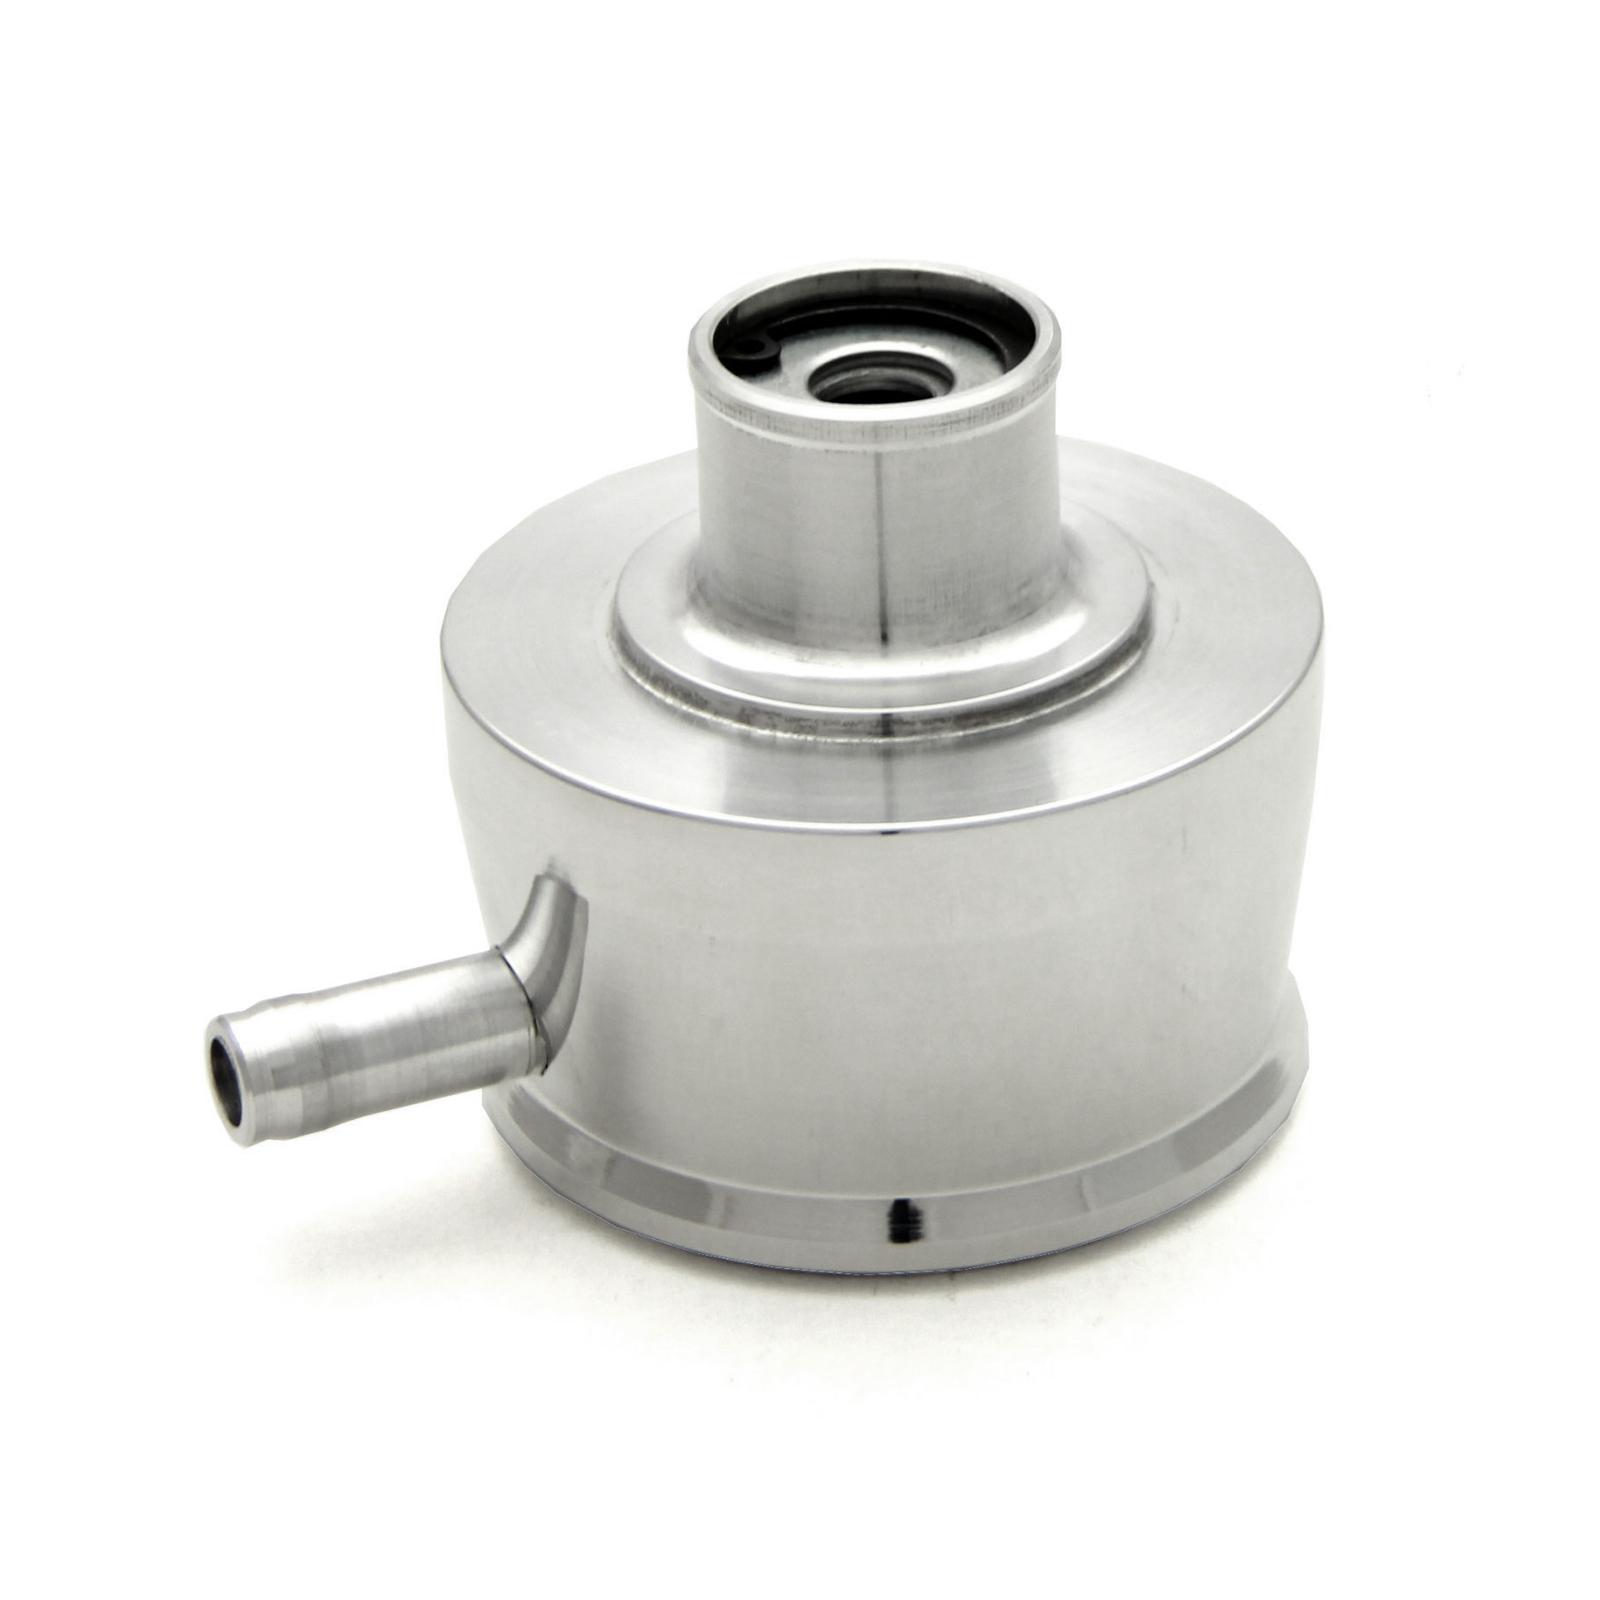 Aluminum Valve Cover Breather Cap & Gromment w/Pcv Valve & Vent Tube to -Push In